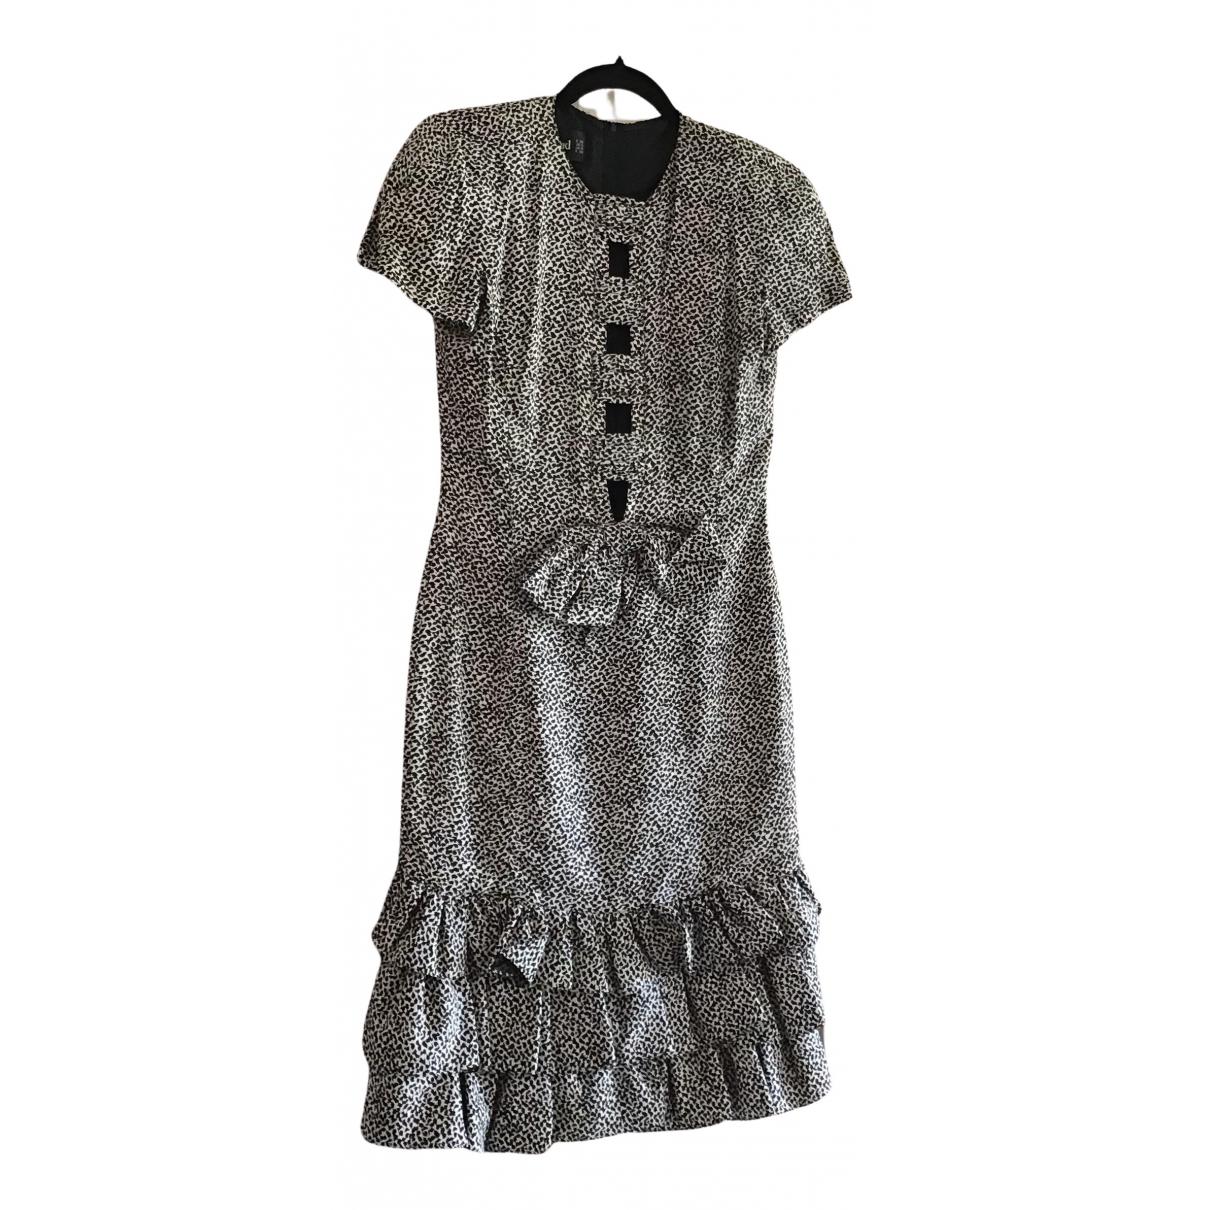 Louis Feraud \N Kleid in  Bunt Seide